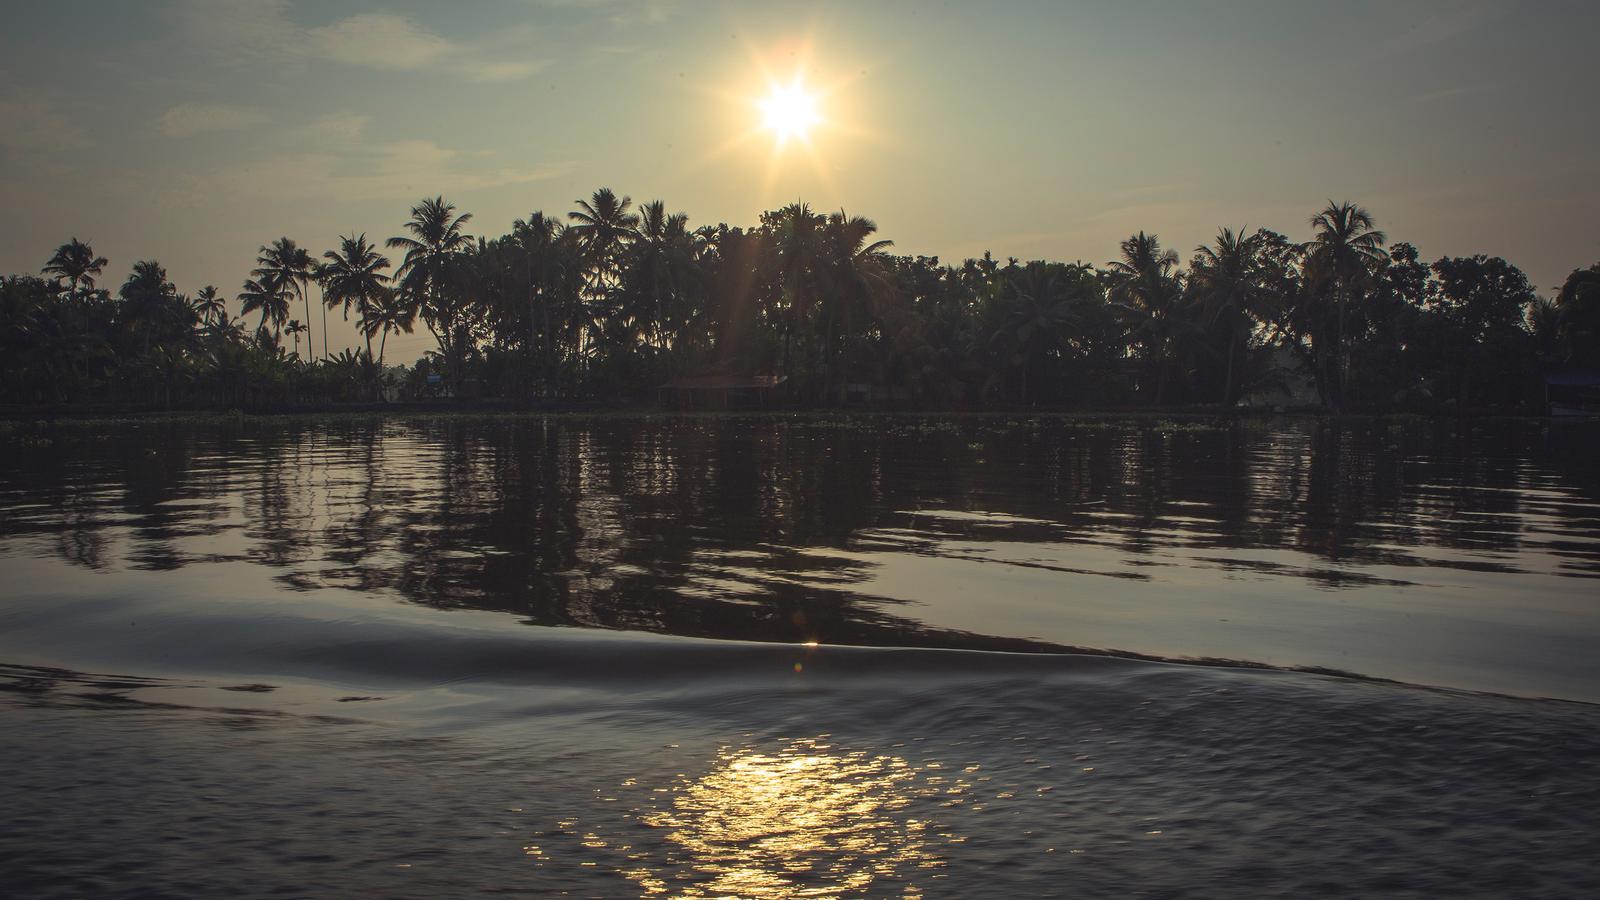 Backwaters Indien Reise für junge Leute in der Gruppe traveljunkies